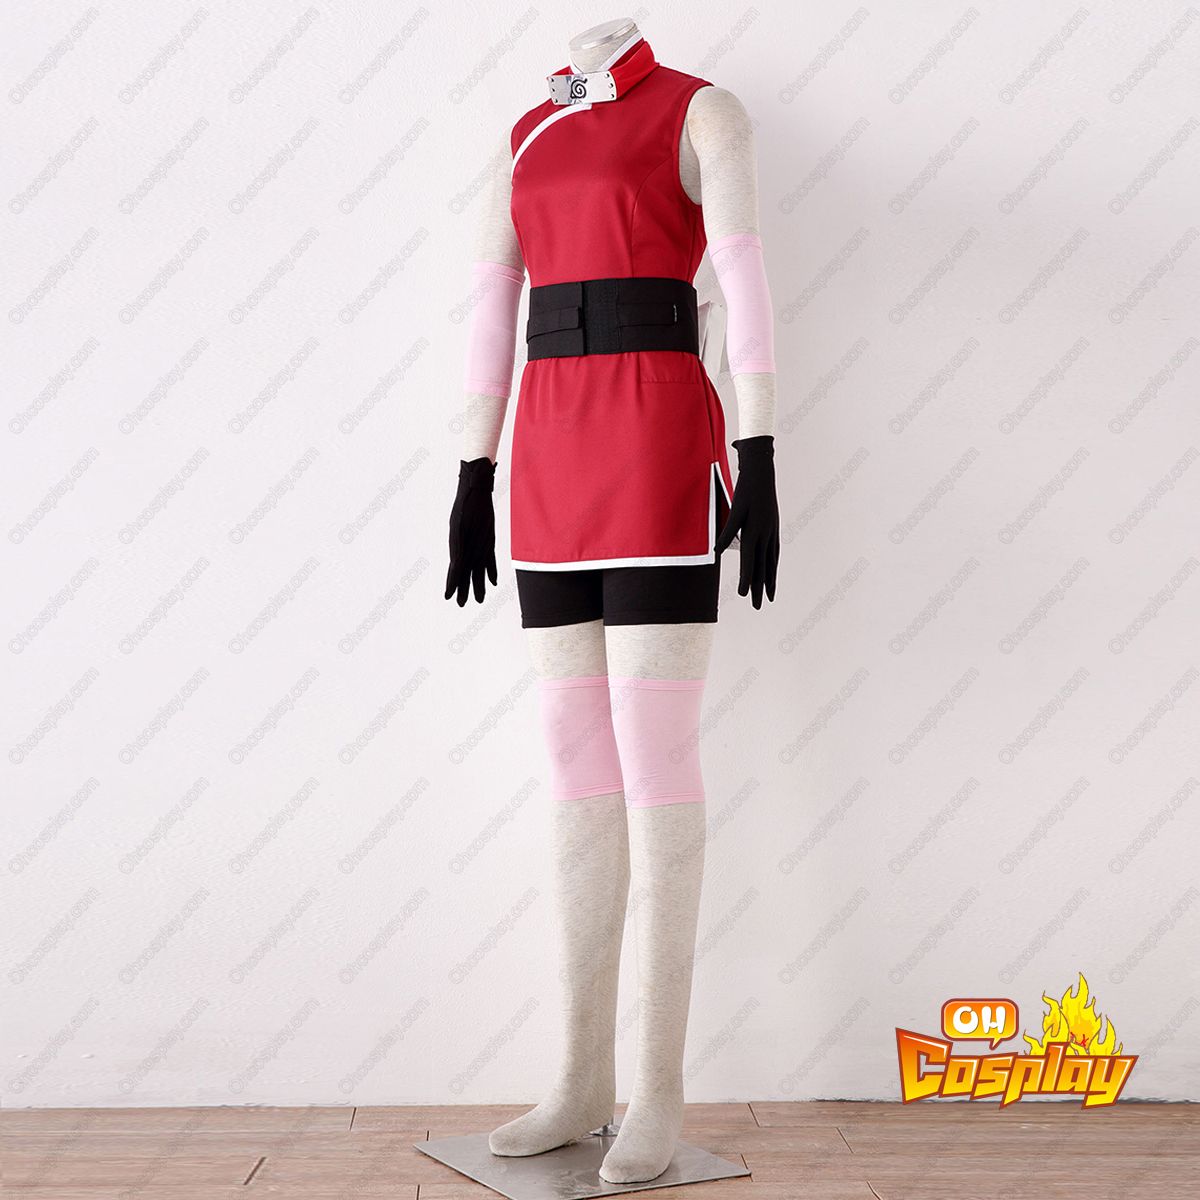 Naruto Sakura Haruno 3RD Cosplay Costumes Deluxe Edition